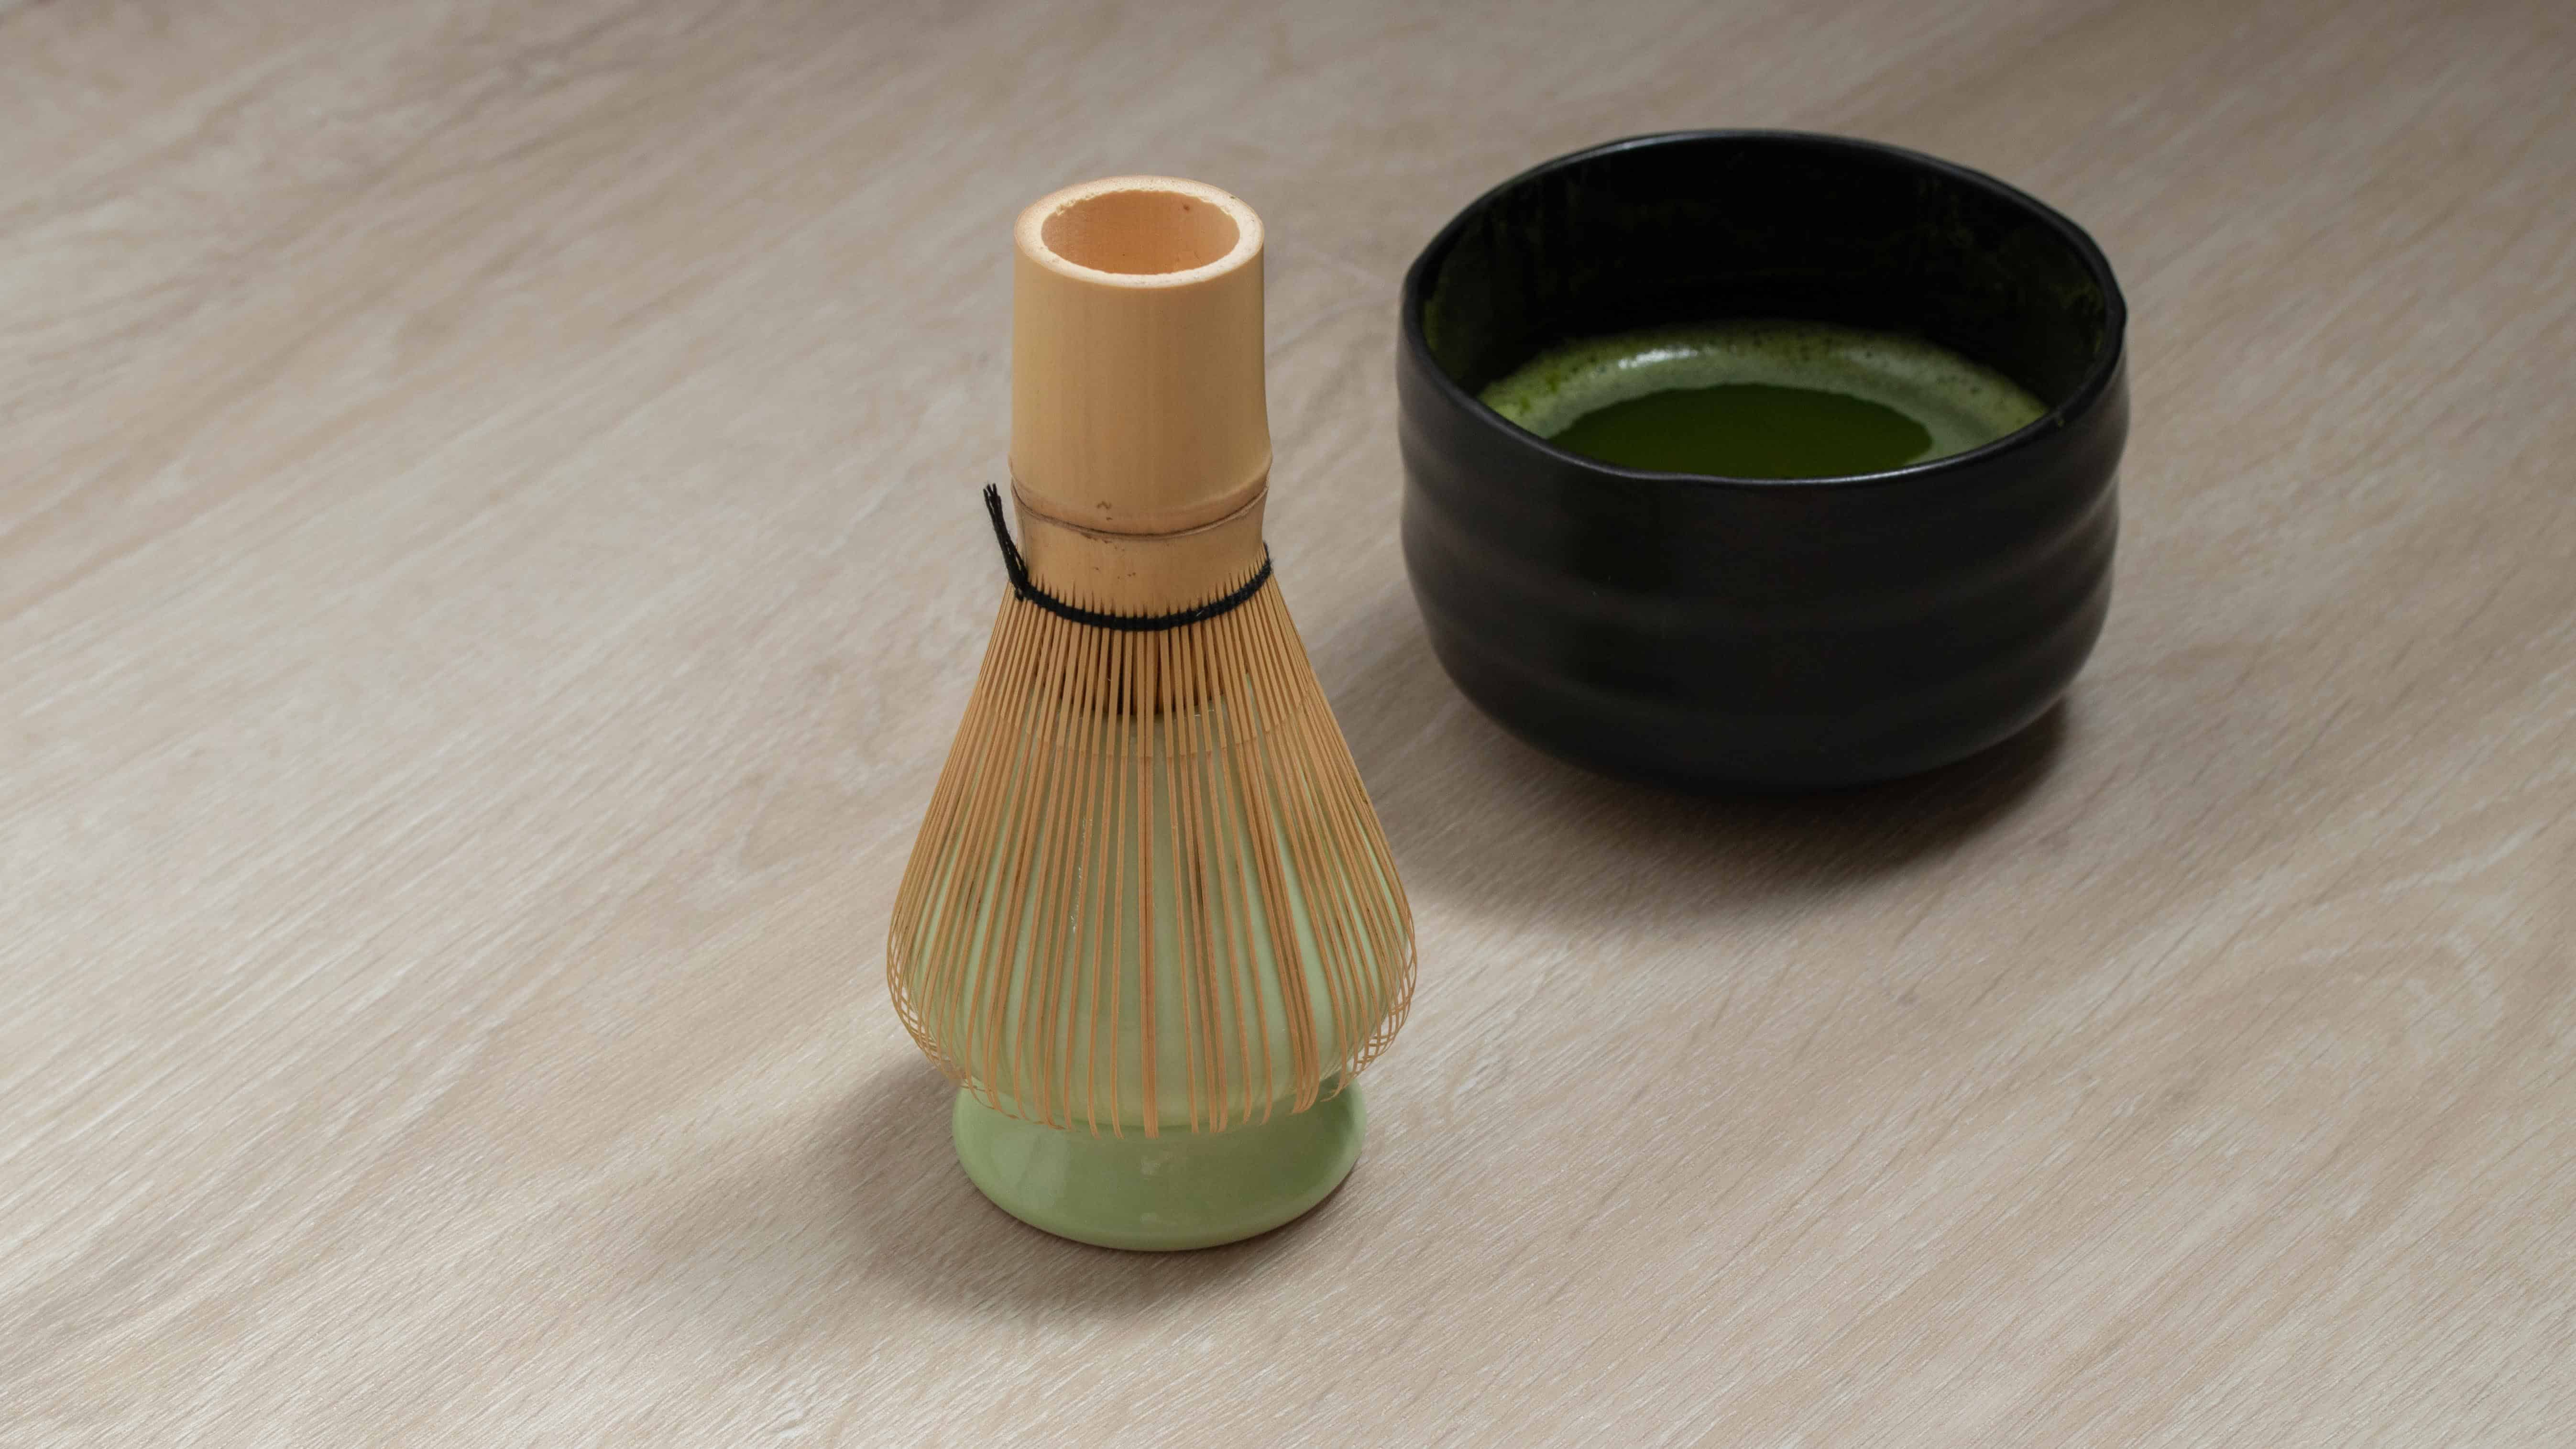 bamboo whisk on drying on matcha holder